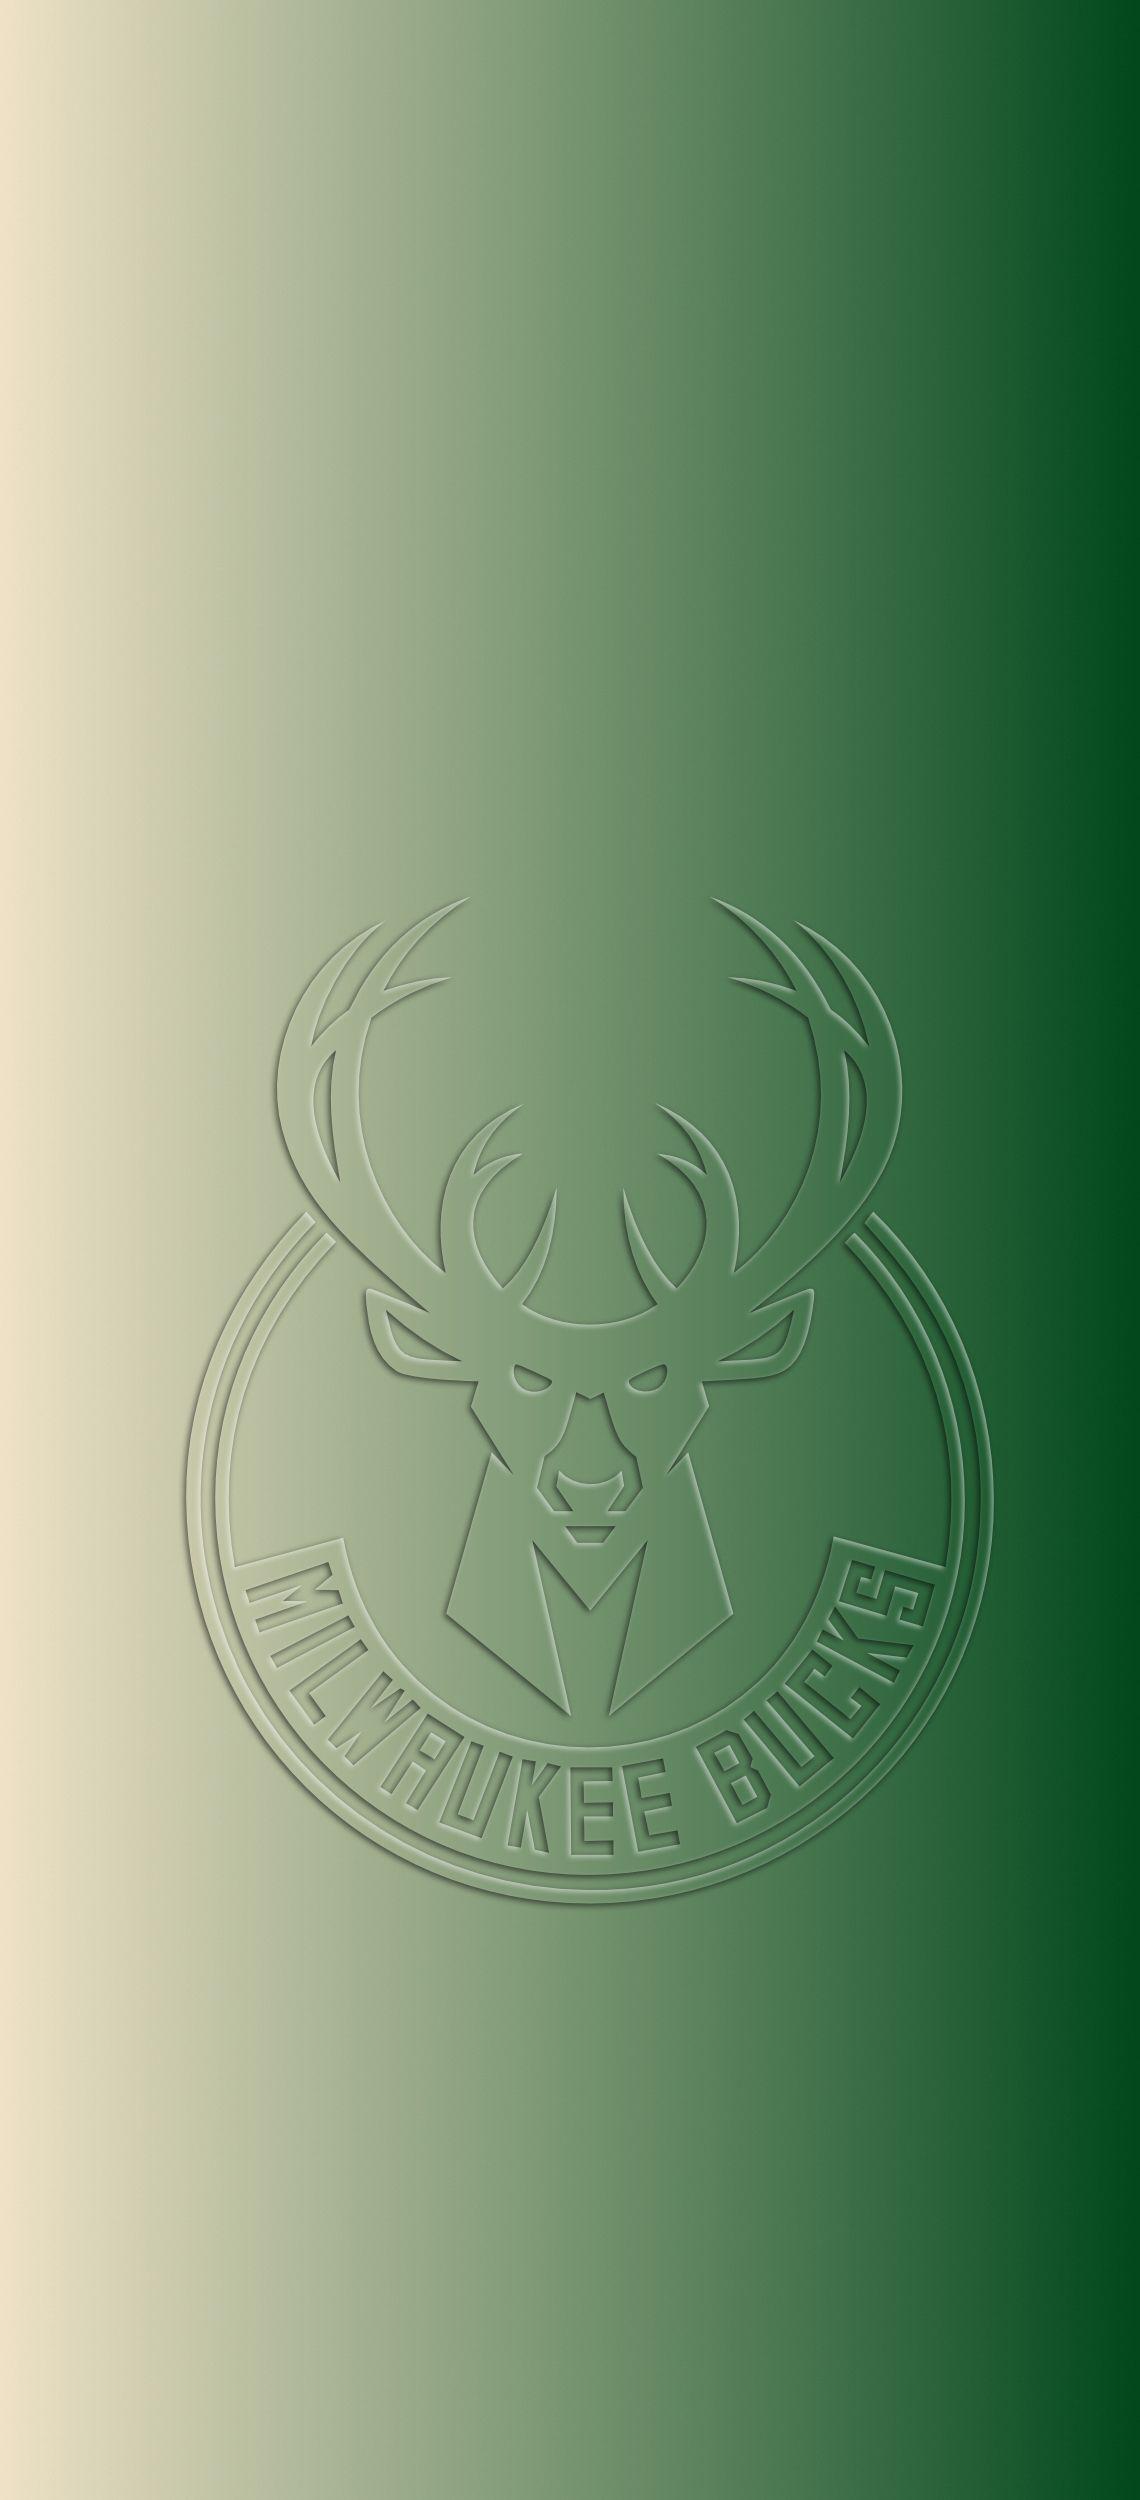 Milwaukee Bucks 3d Wallpaper Milwaukee Bucks Nba Basketball Teams Nba